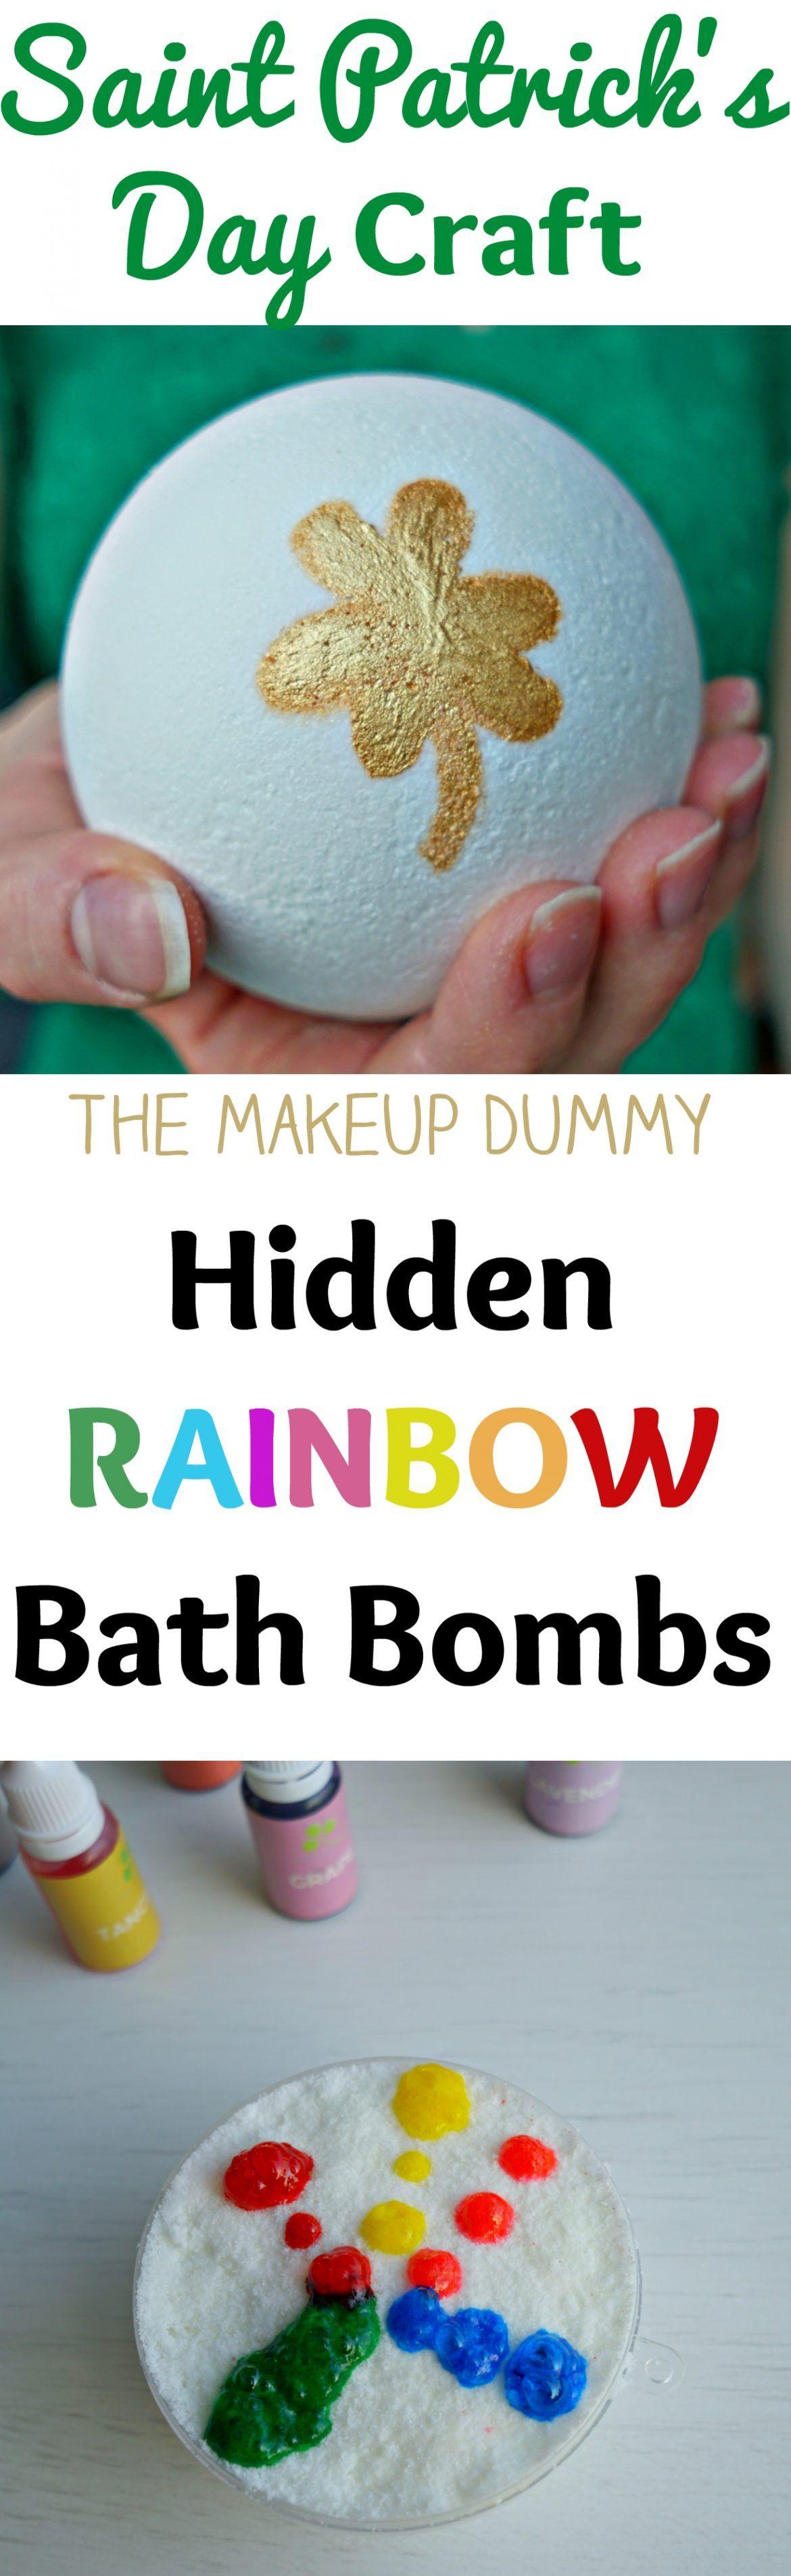 Diy Hidden Rainbow Bath Bomb Review Liquid Soap Dye Recipe Rainbow Bath Bomb Bath Bombs Bath Bomb Gift